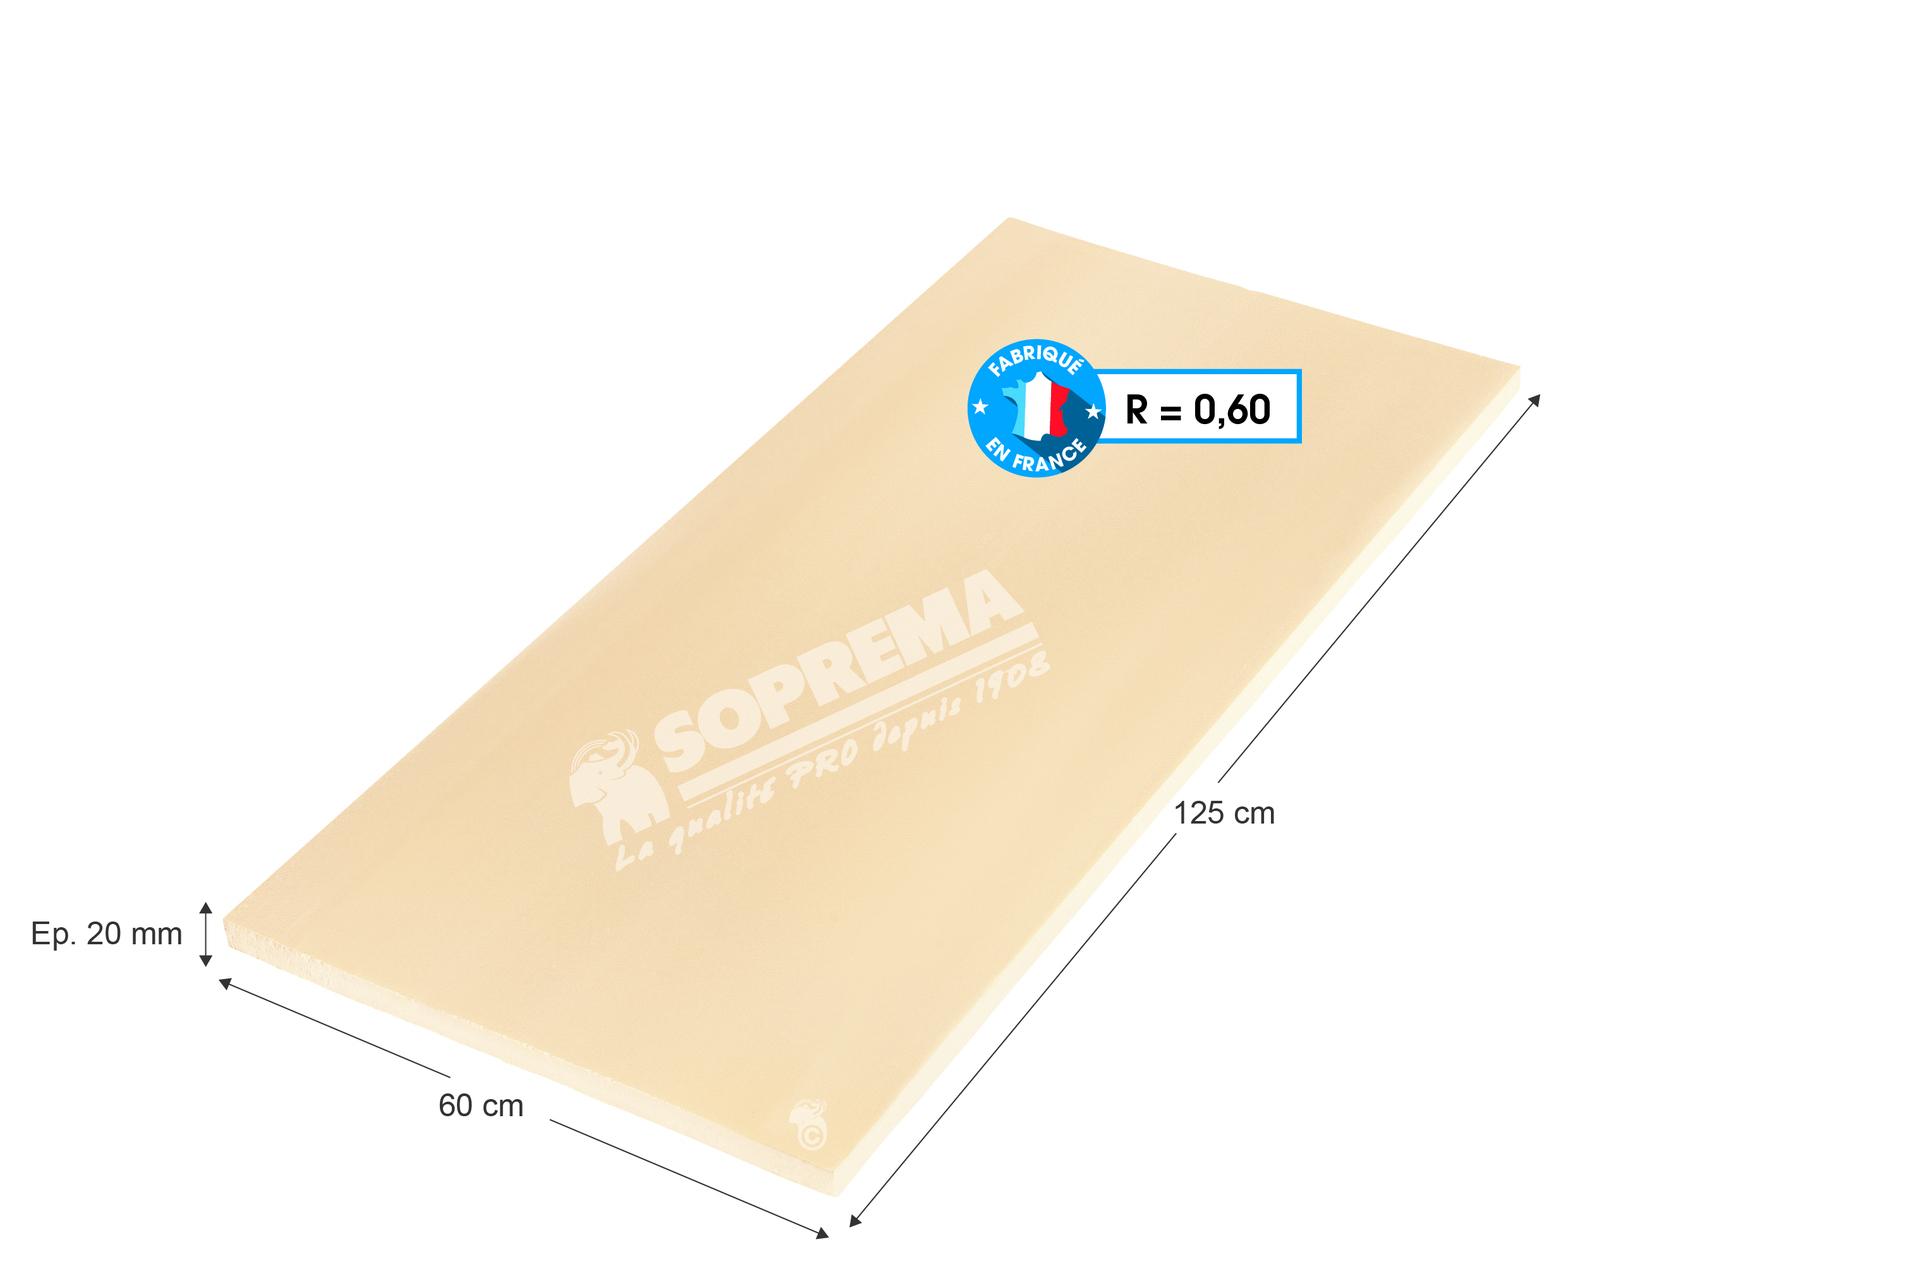 Panneau En Polystyrène Extrudé Xps Soprema, 1.25X0.6M, Ep.20Mm, R=0.60 tout Bille Polystyrène Isolation Leroy Merlin